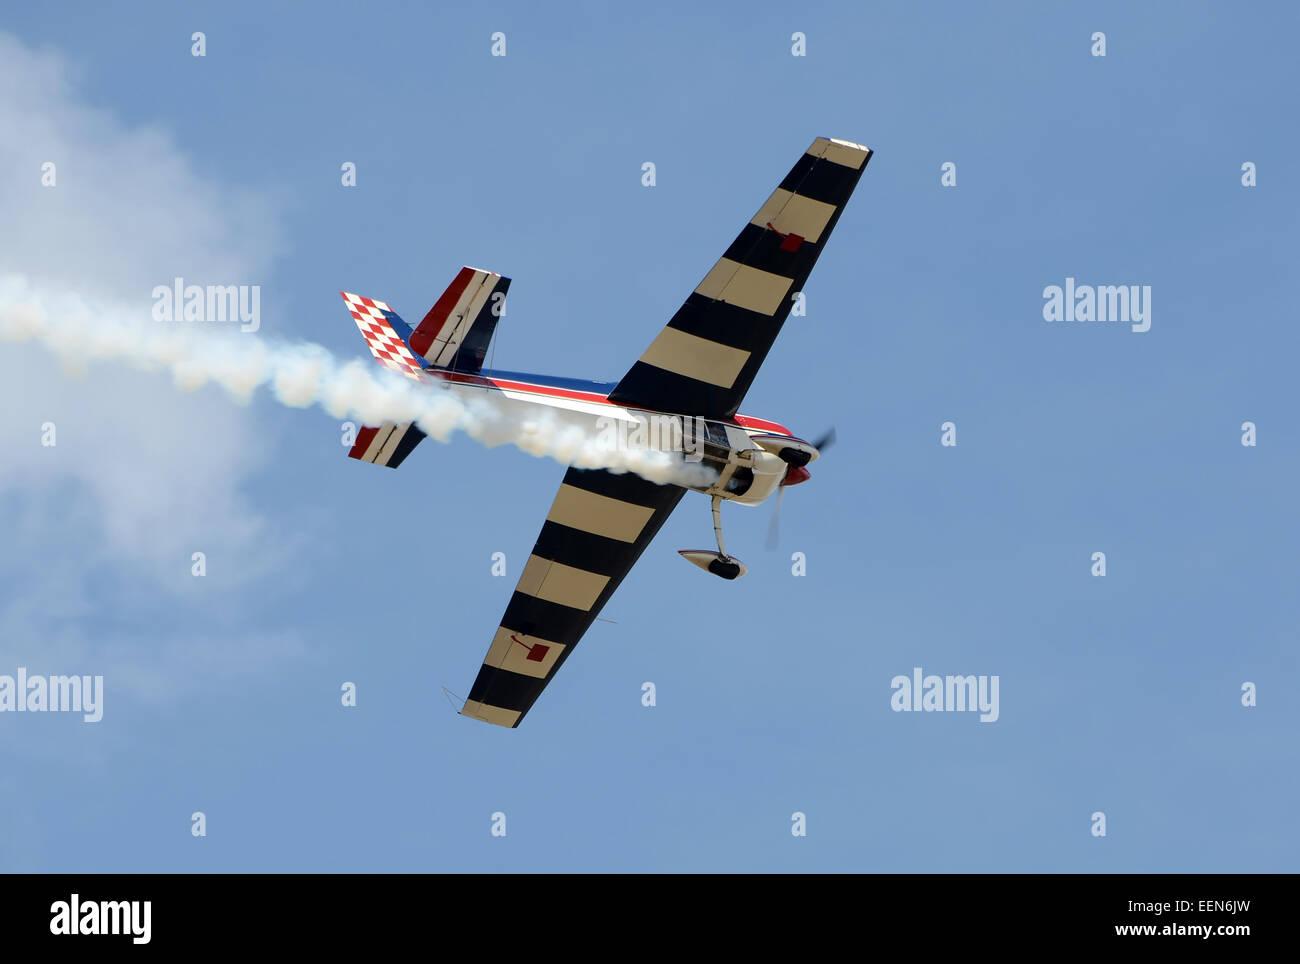 Light aerobatic airplane practicing maneuvers - Stock Image